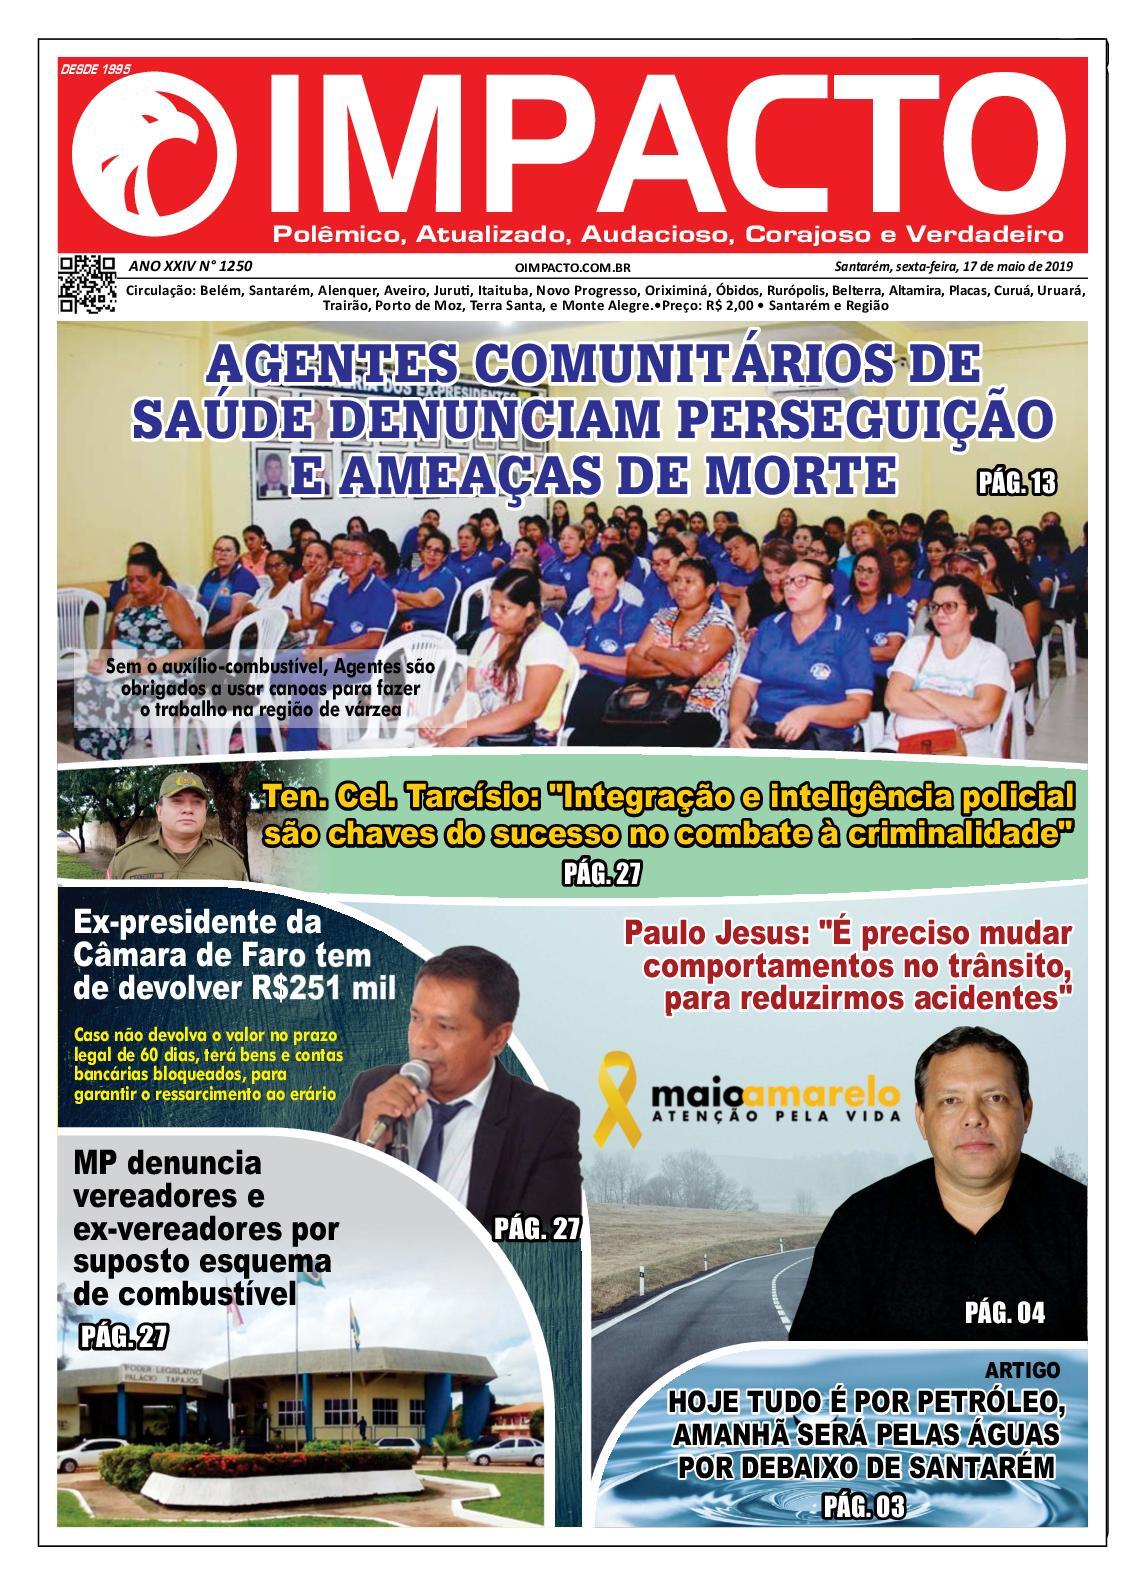 02e3e94f33 Calaméo - Jornal O Impacto Ed. 1250